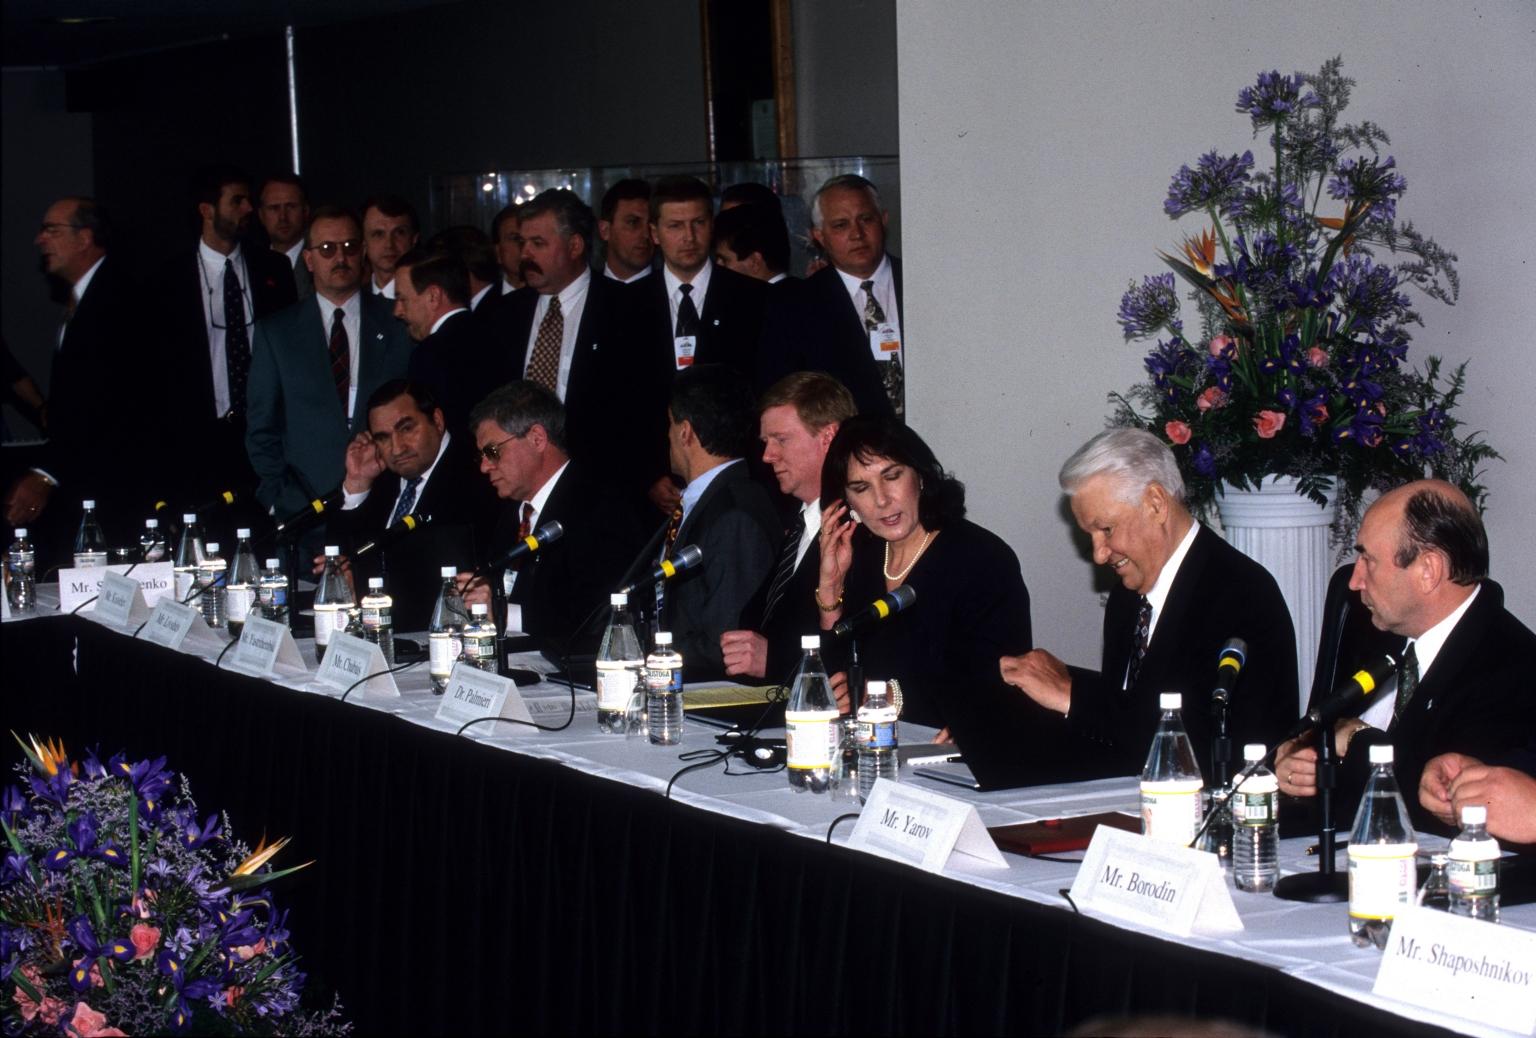 Boris Yeltsin's visit to the museum